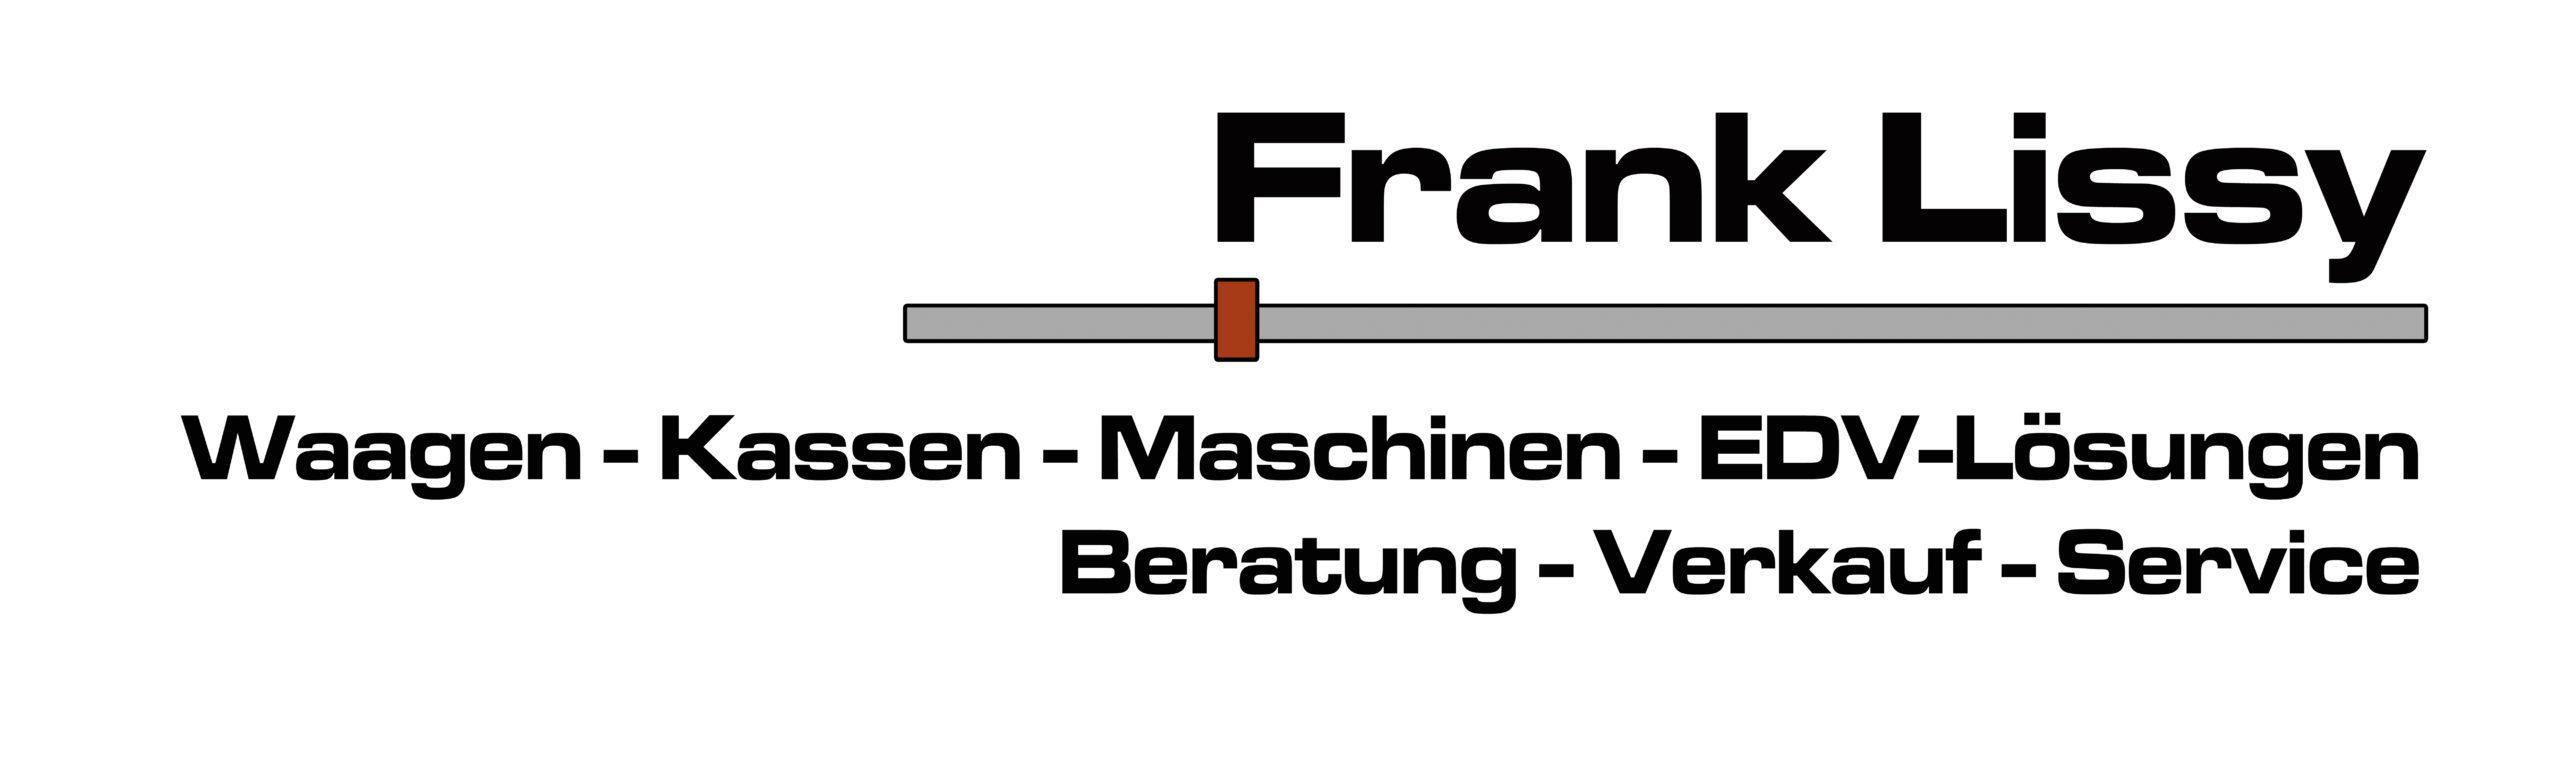 Frank Lissy Verkauf & Service